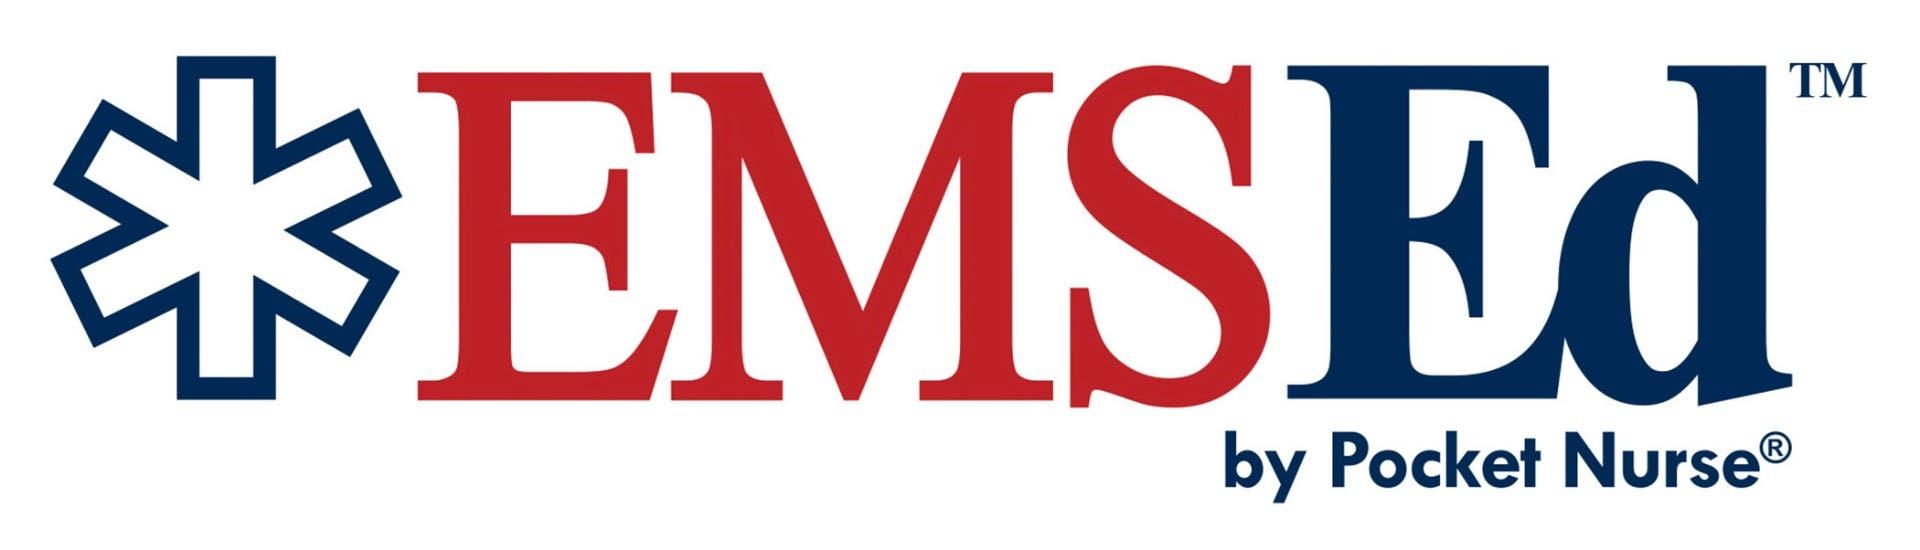 Home Page Nurse Kit Standart Pharm Ed Ems